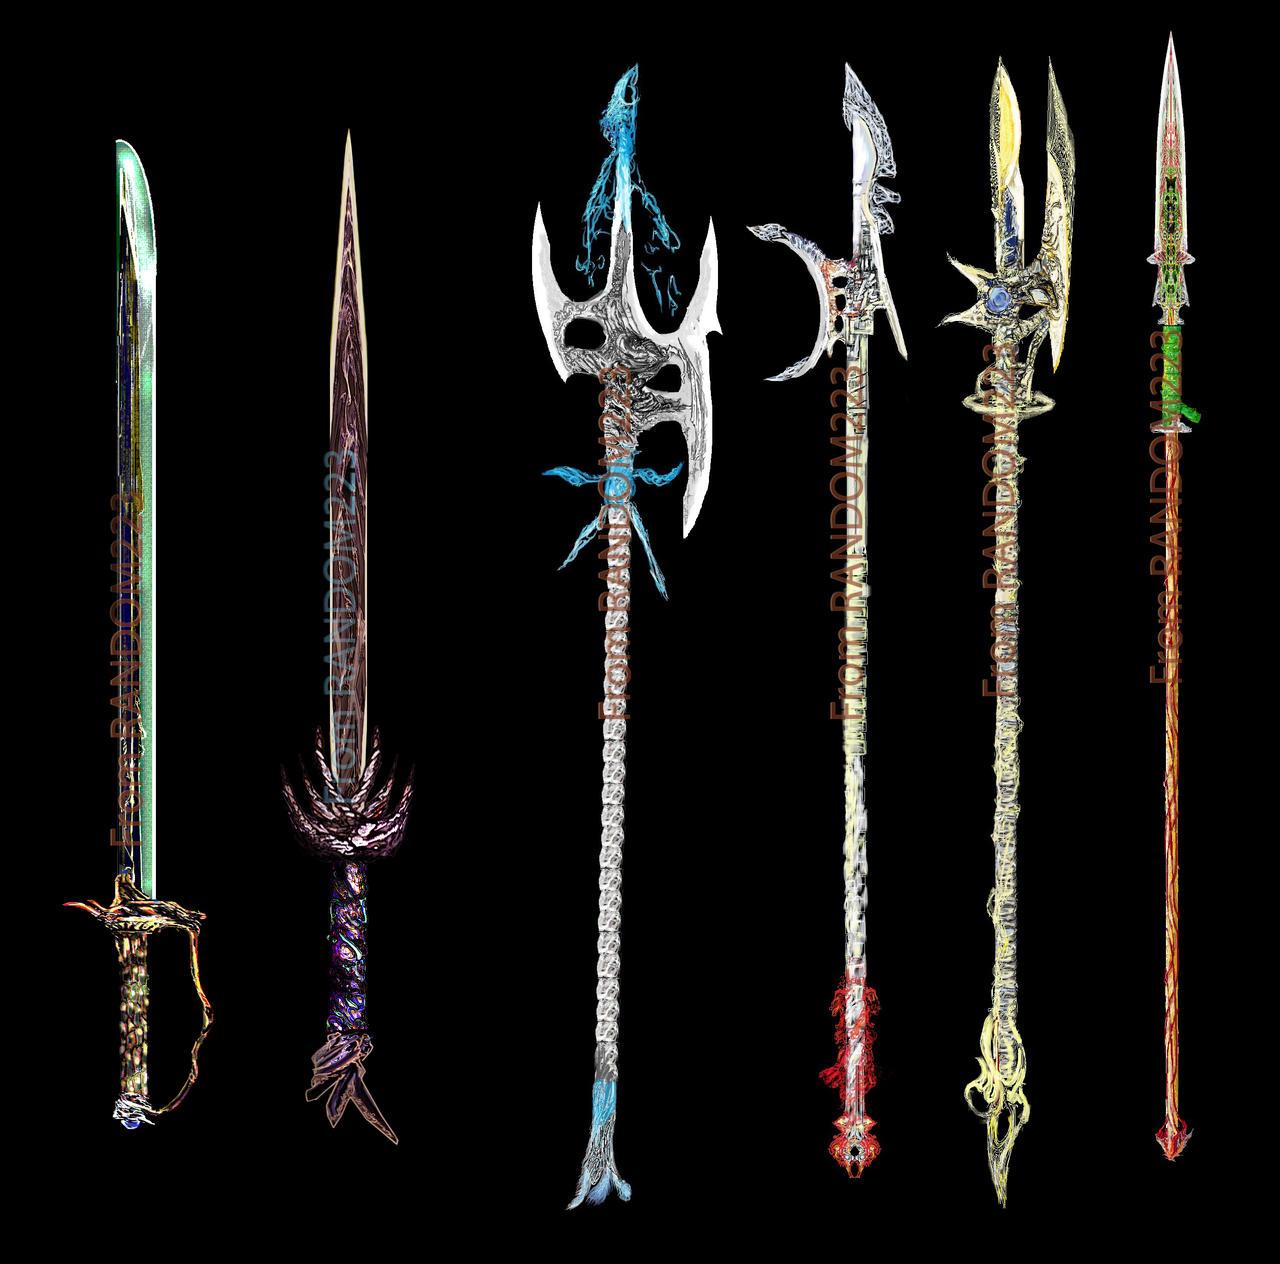 Weaponry 354 by Random223